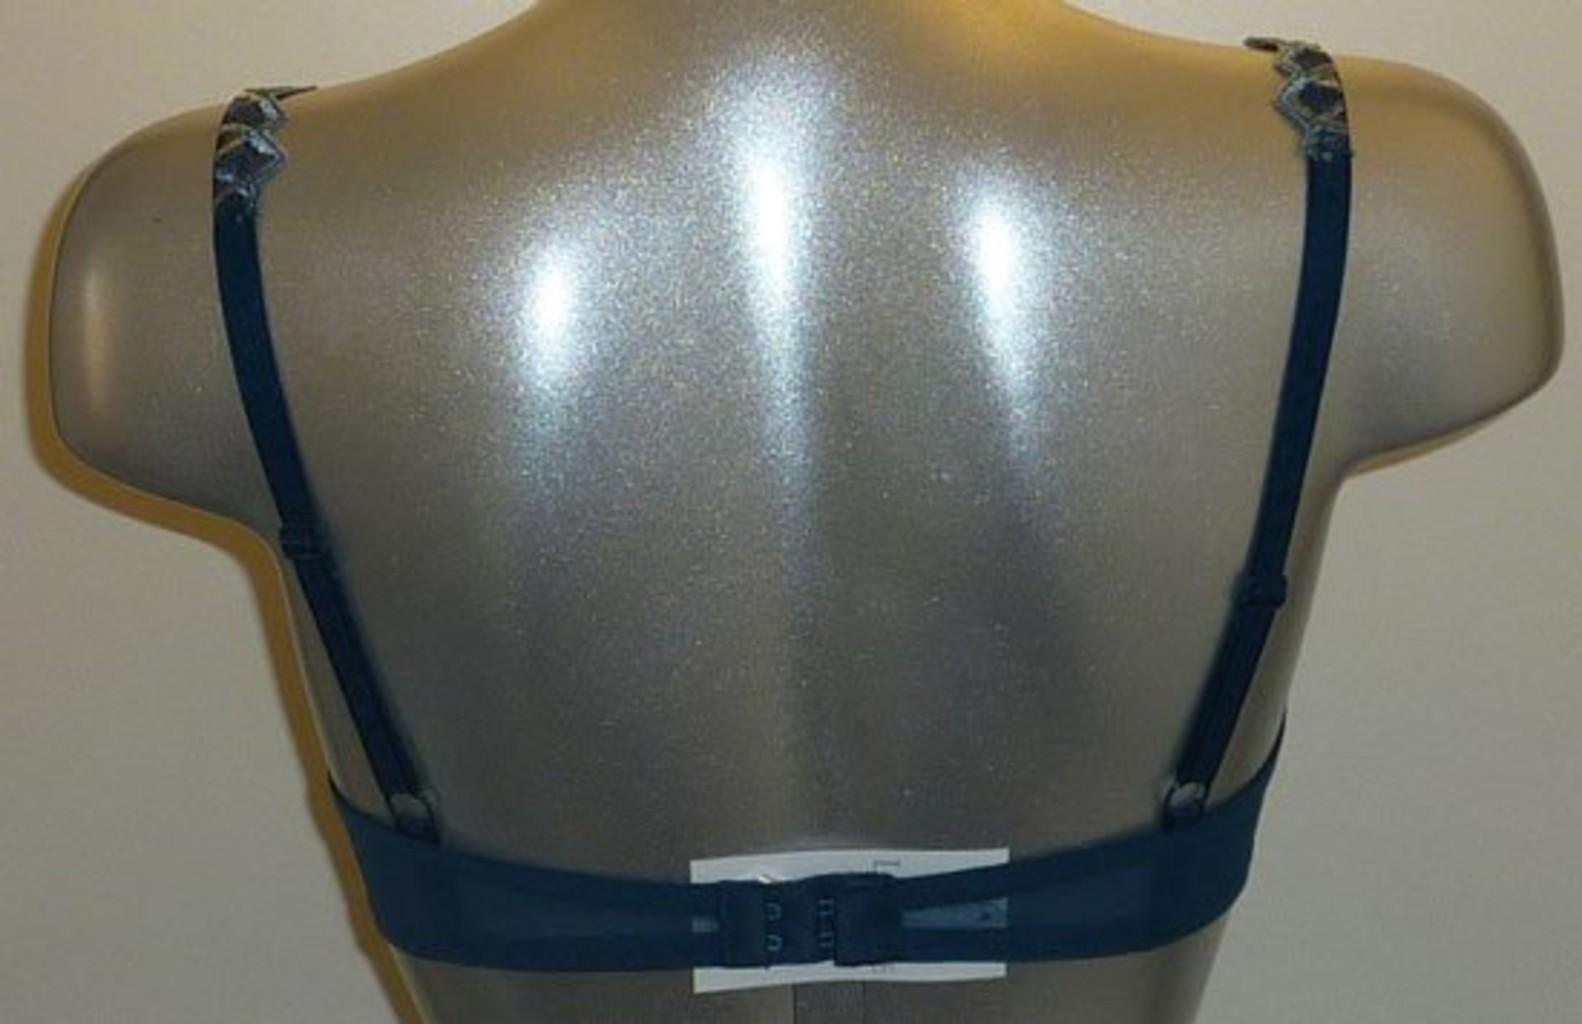 LingaDore LingaDore Kourtney Bh met lichte voorvorm kleur petrol